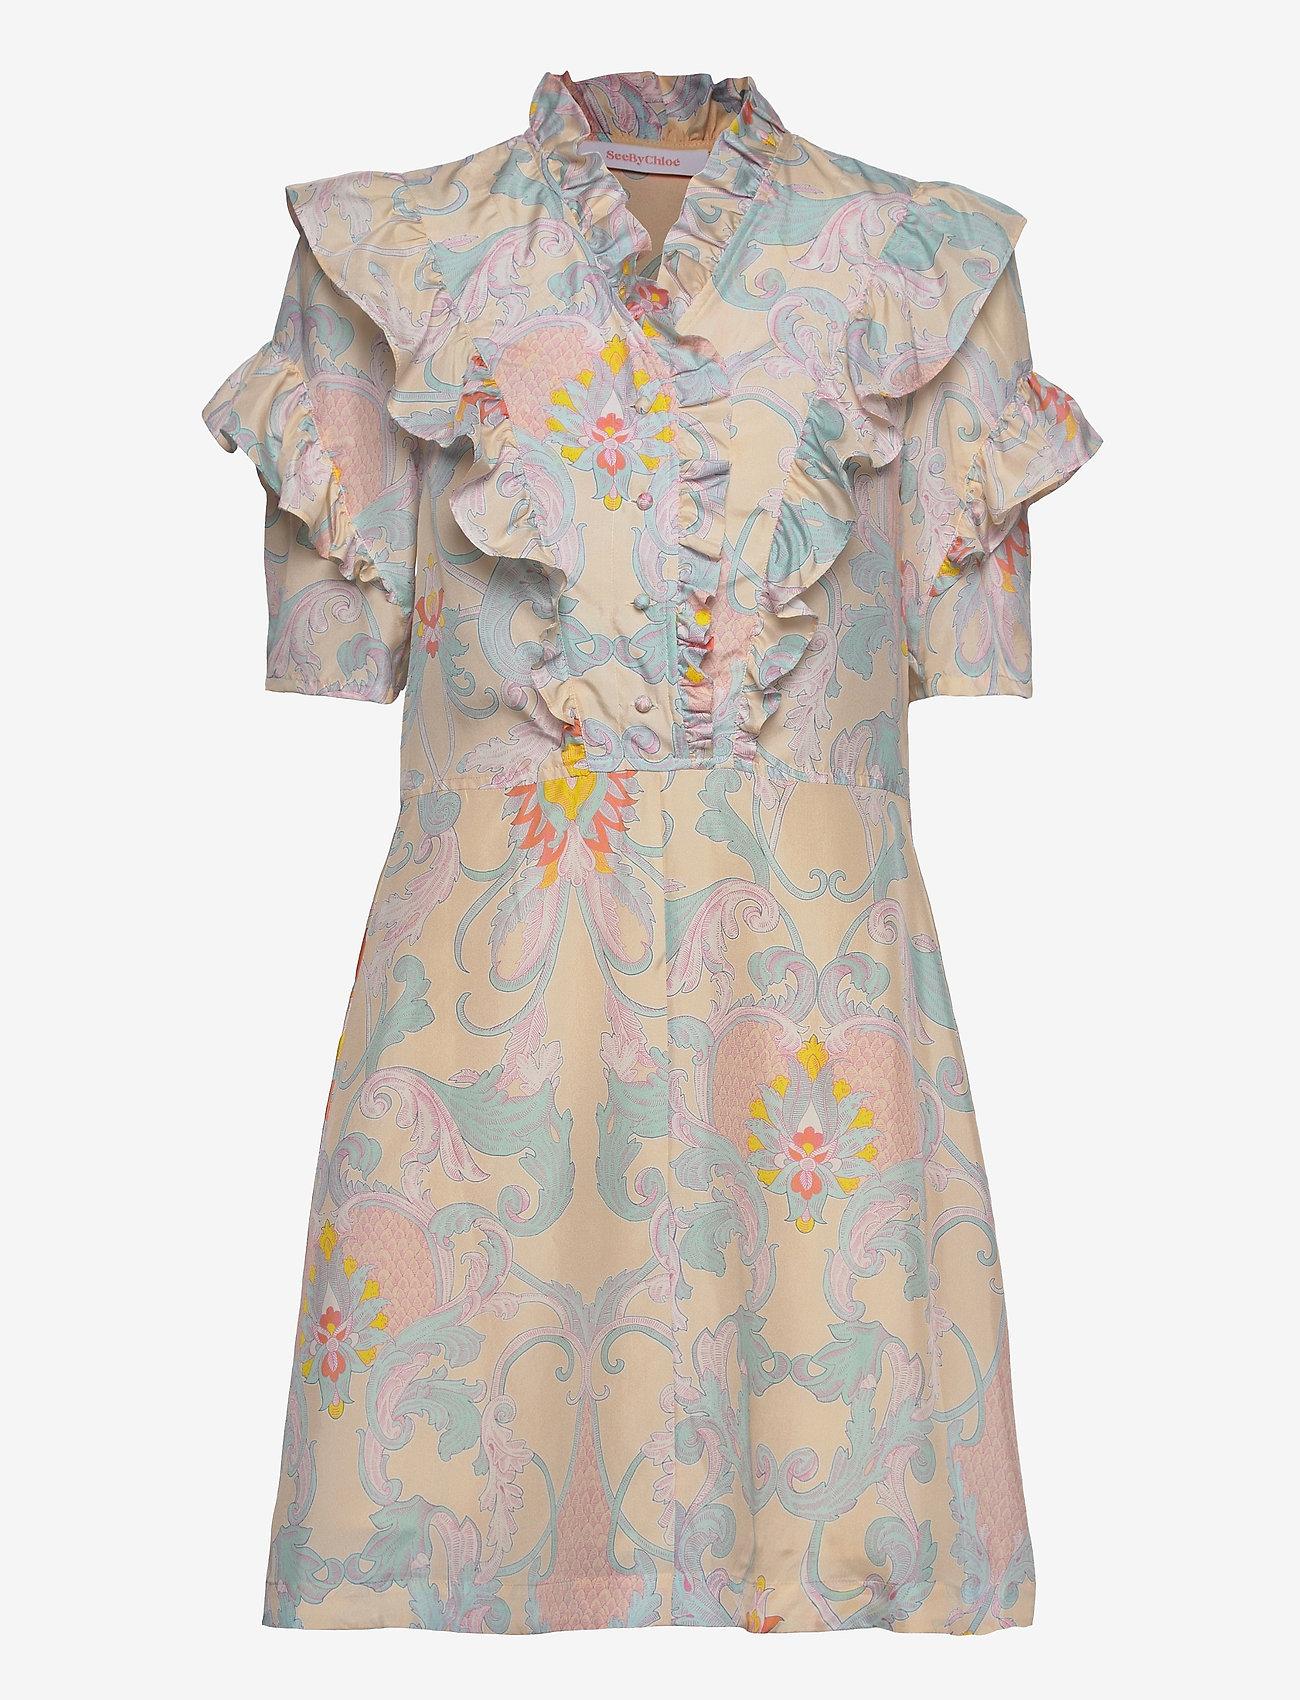 See by Chloé - DRESS - sommerkjoler - multicolor yellow 1 - 0